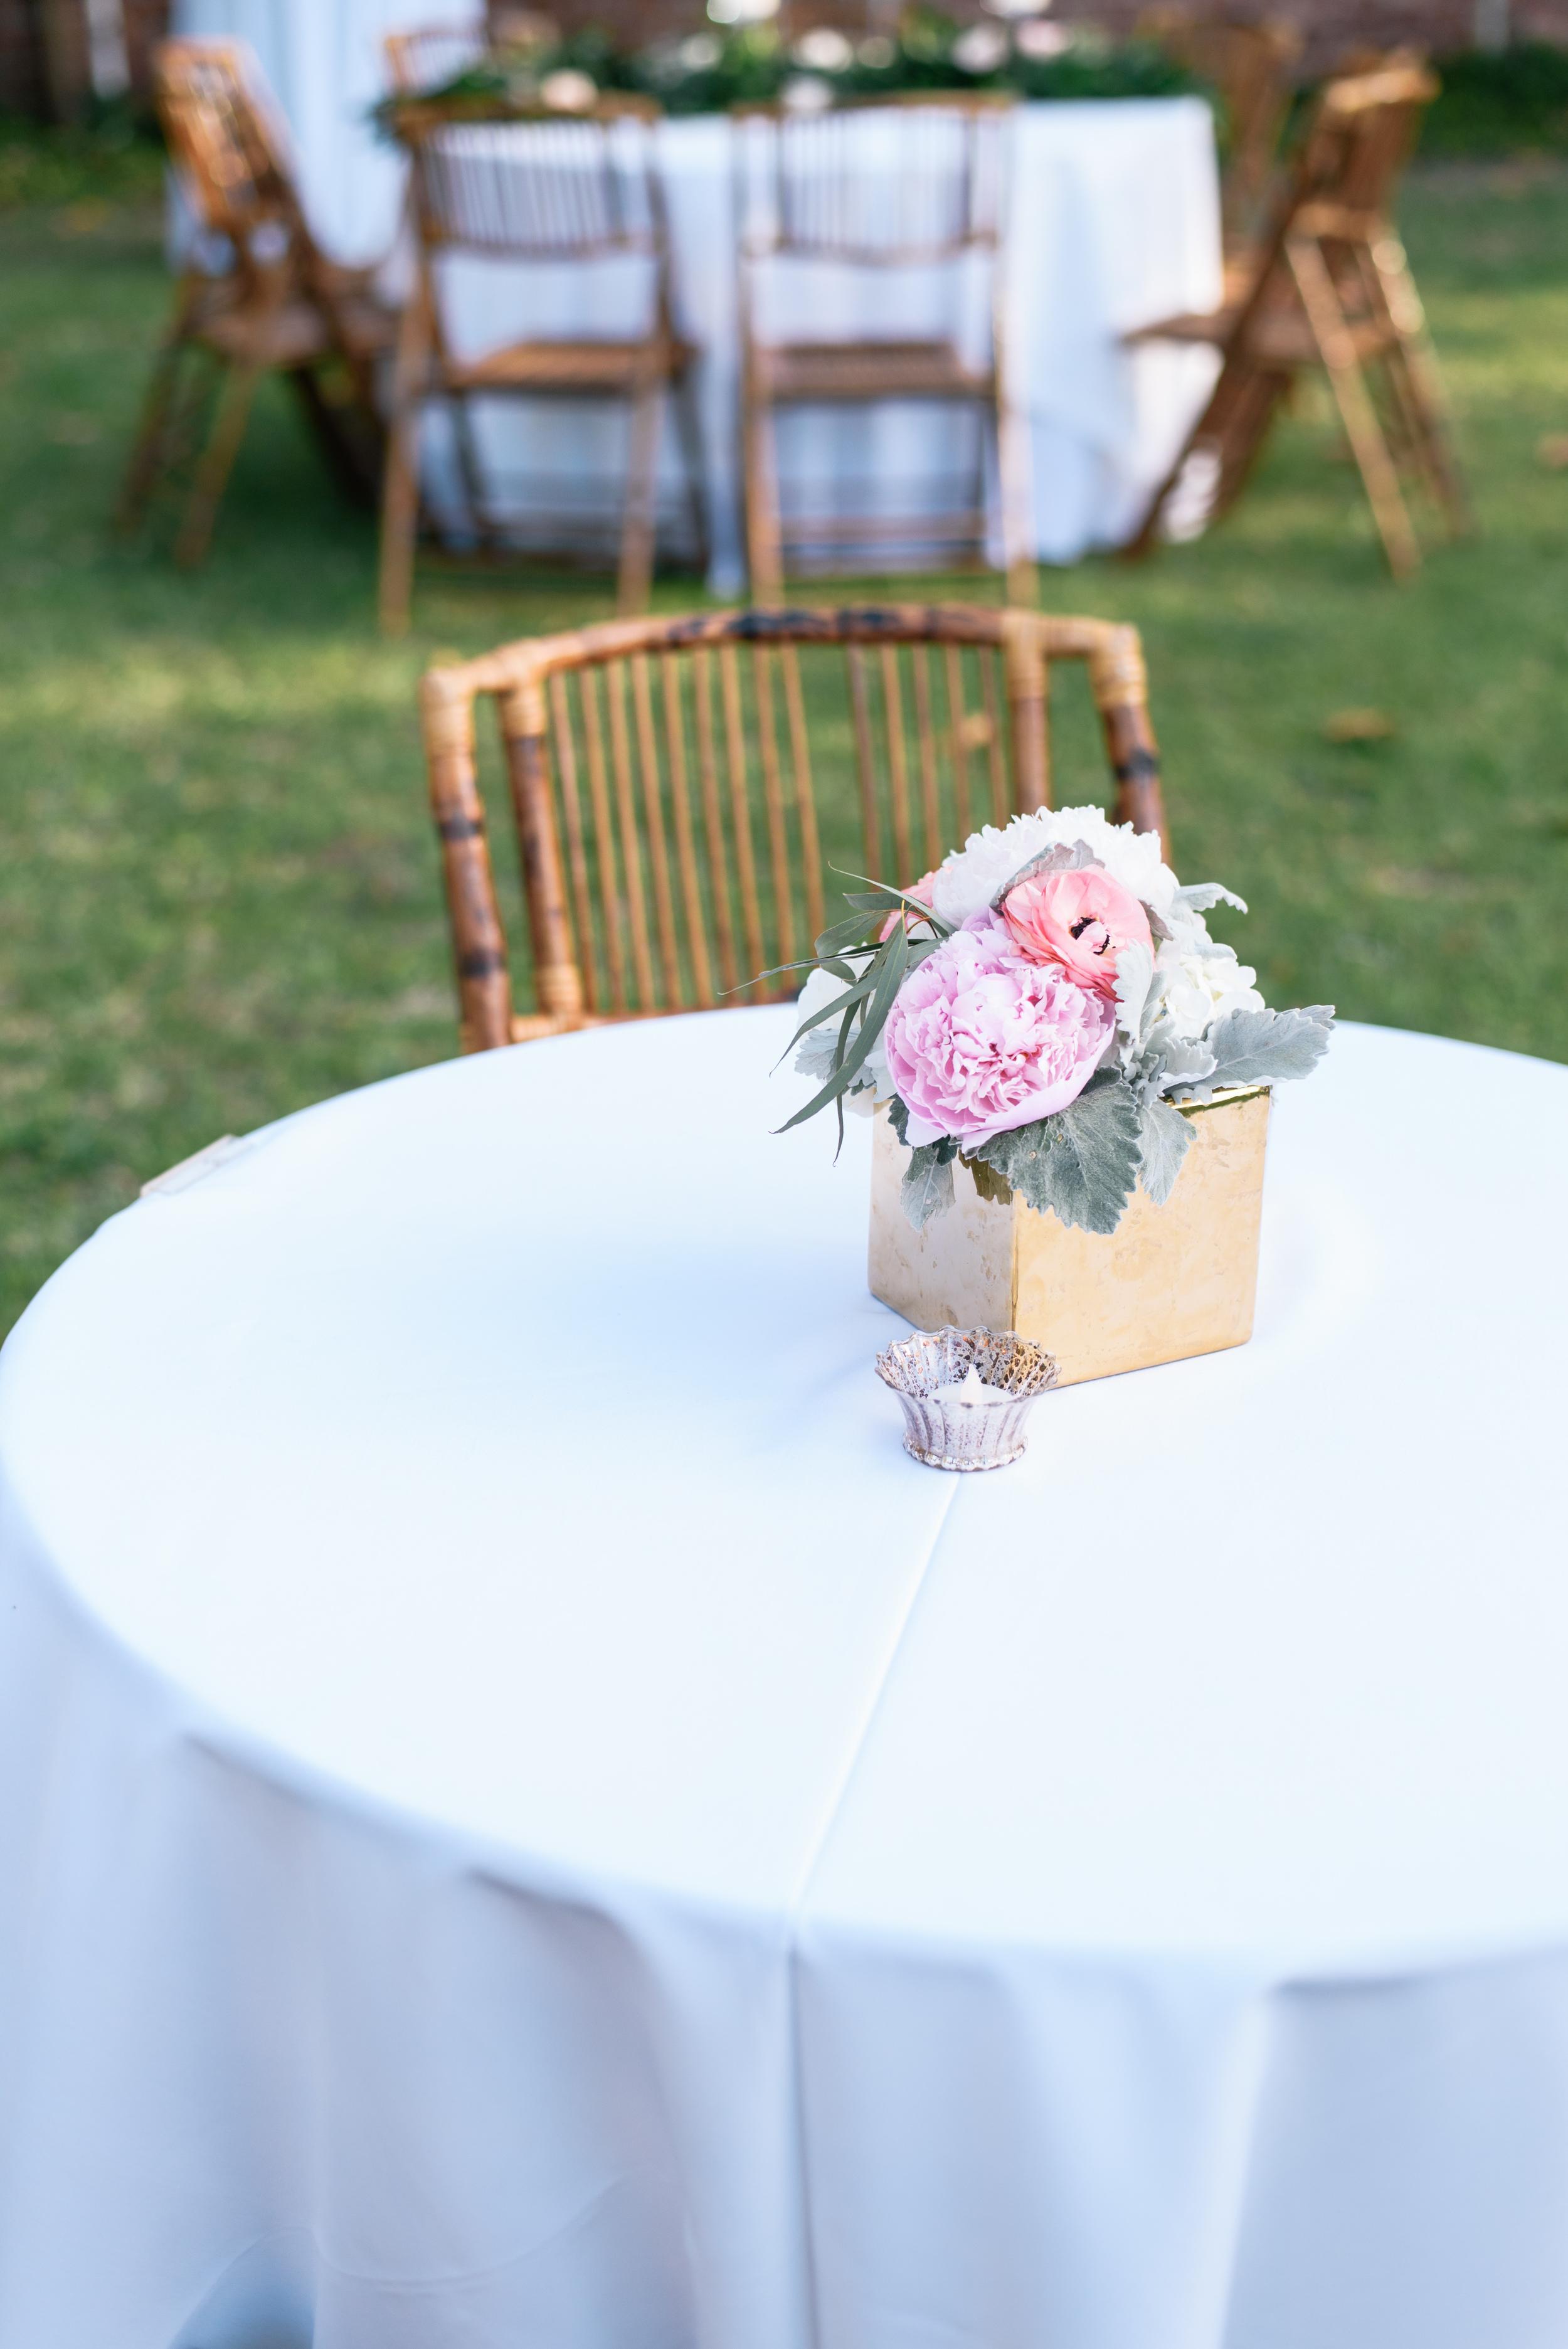 kadi-and-matt-carroll-april-9-2016-jekyl-island-wedding-m-newsom-photography- (273 of 484).jpg